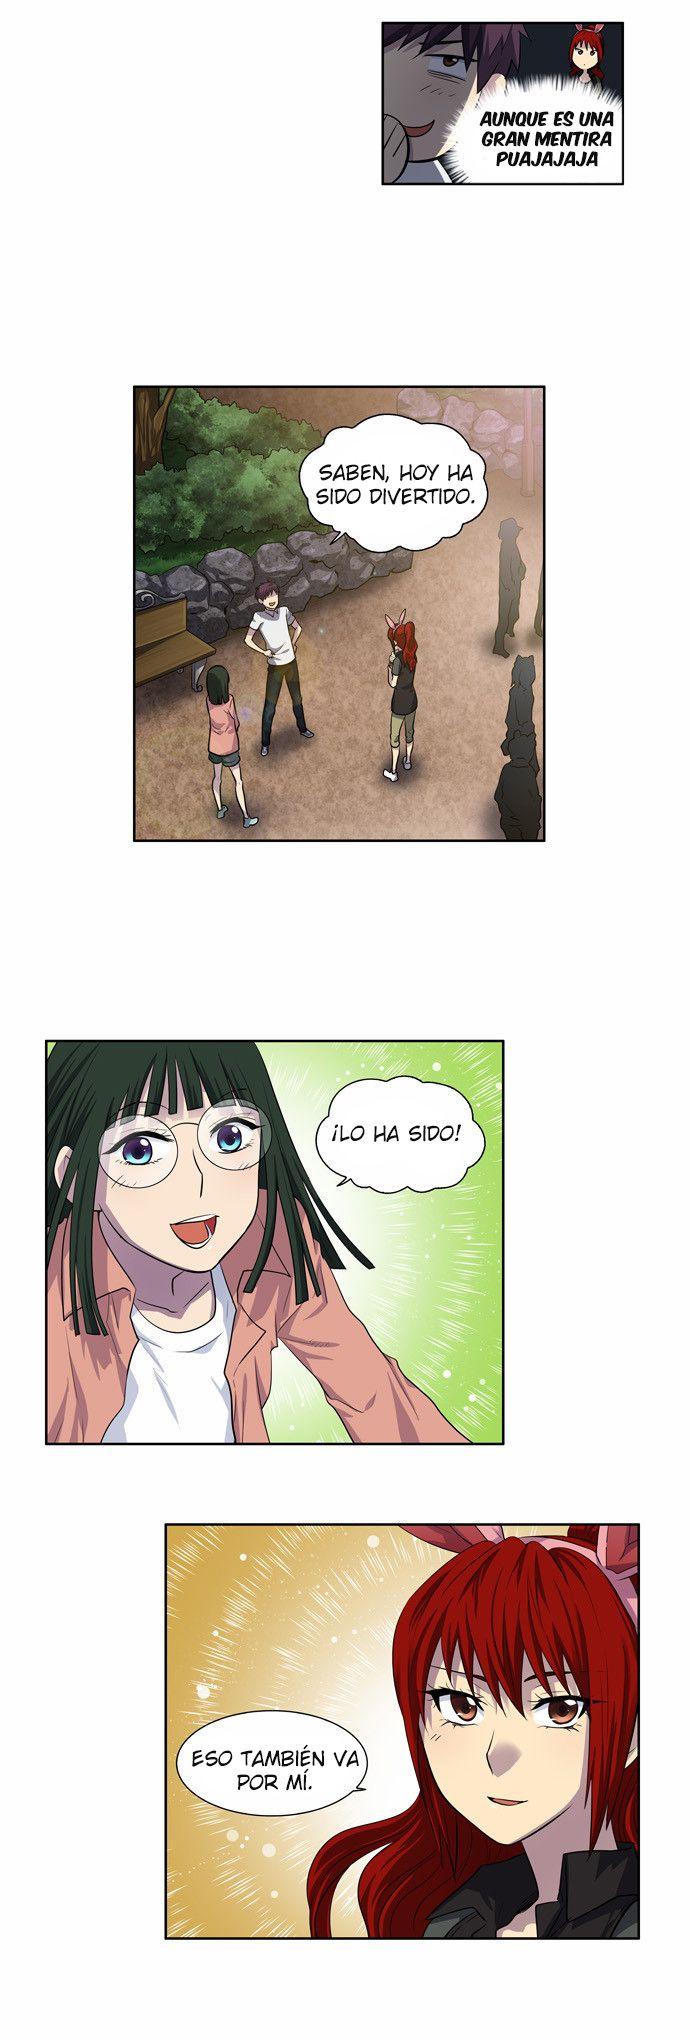 http://c5.ninemanga.com/es_manga/61/1725/478207/3187cdf53c86b95f0028cbce8a03bb27.jpg Page 3